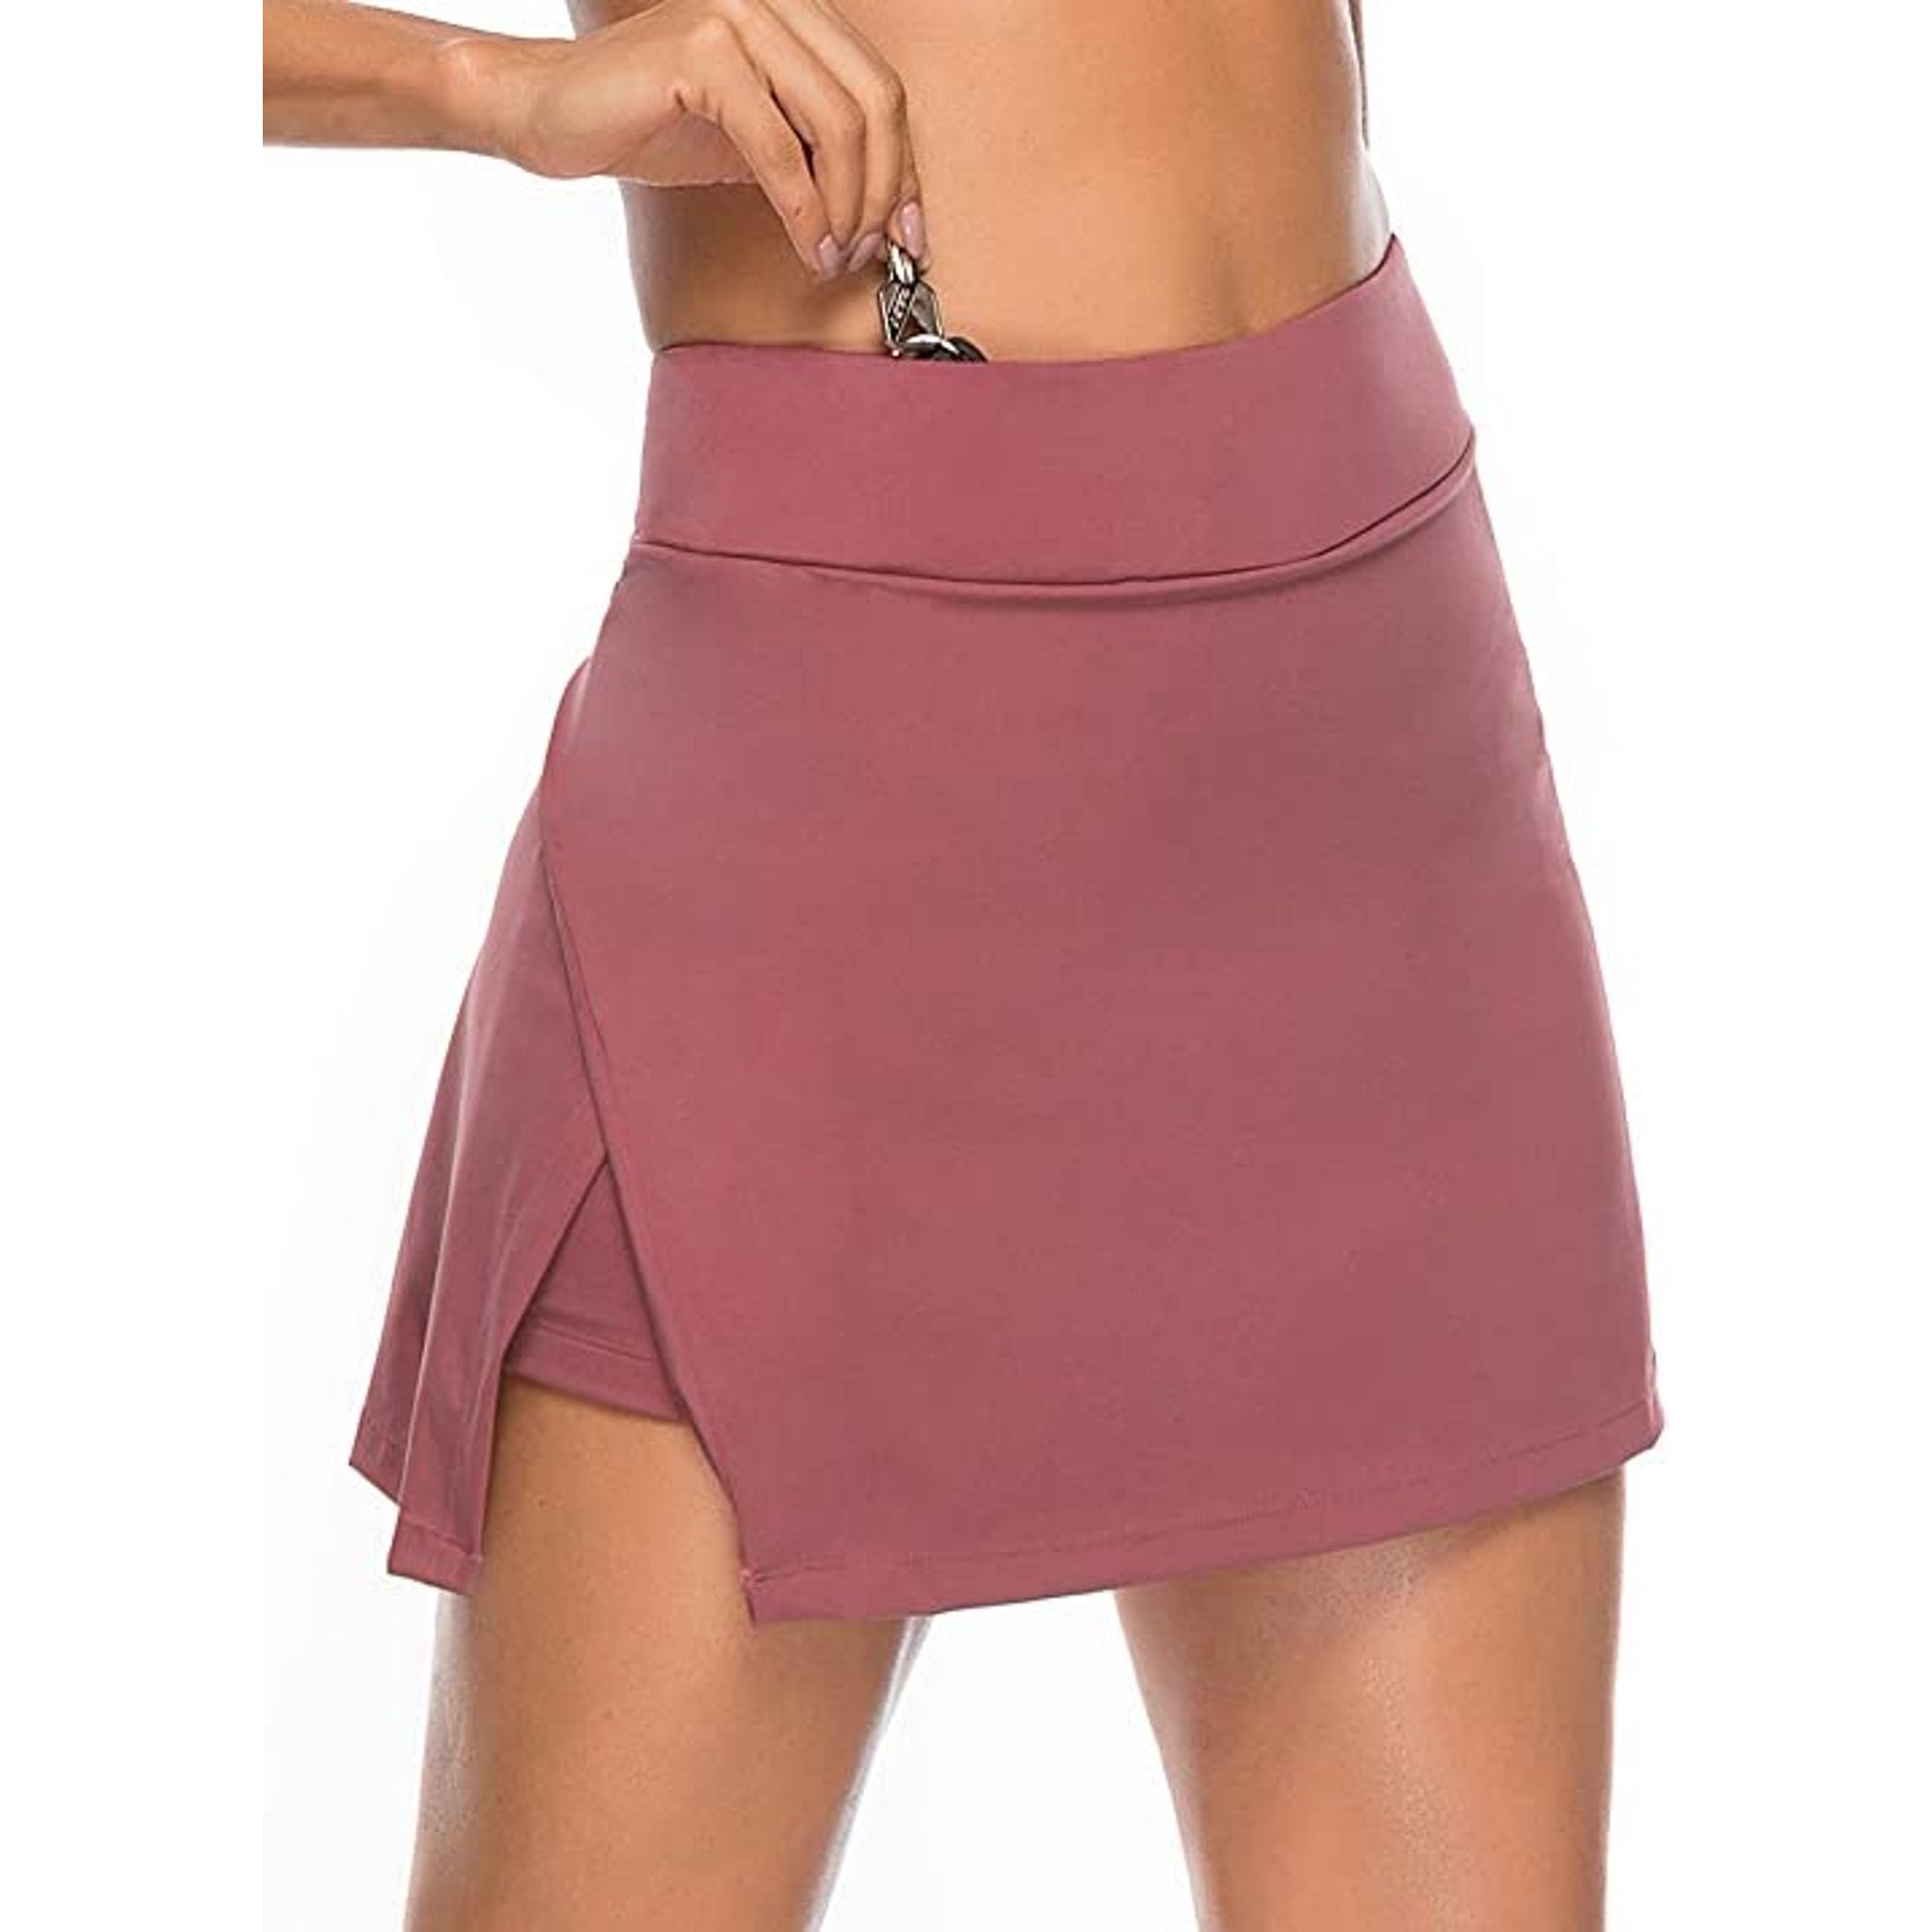 Women's Athletic Skort with Pockets Tennis Golf Gym Workout Skirt Jupe de  sport pour femmes avec poches Tennis Golf Gym Workout Skirt   Walmart Canada